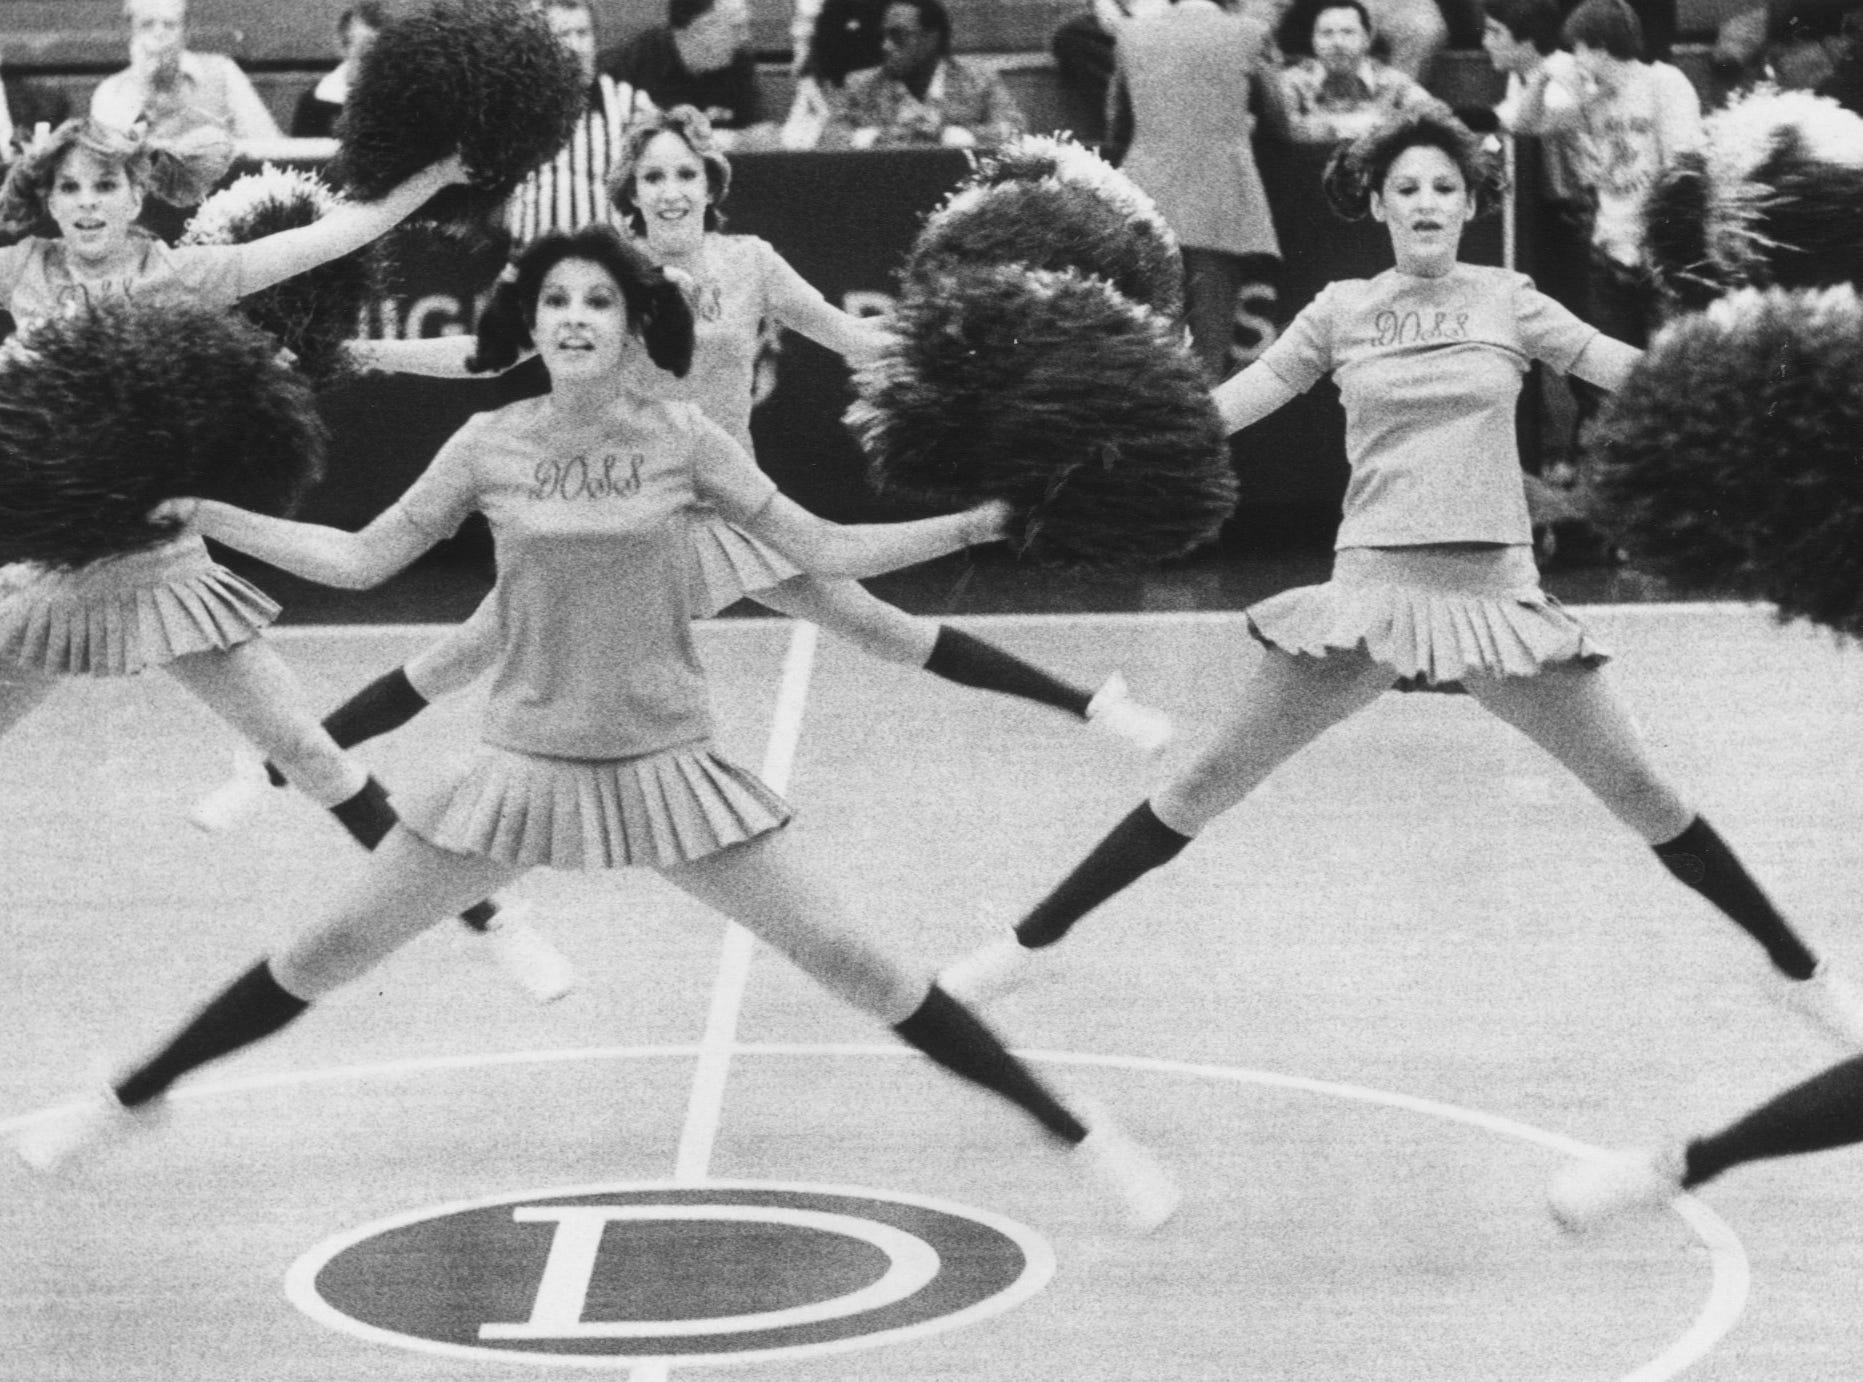 Doss High School cheerleaders. Feb. 19, 1980